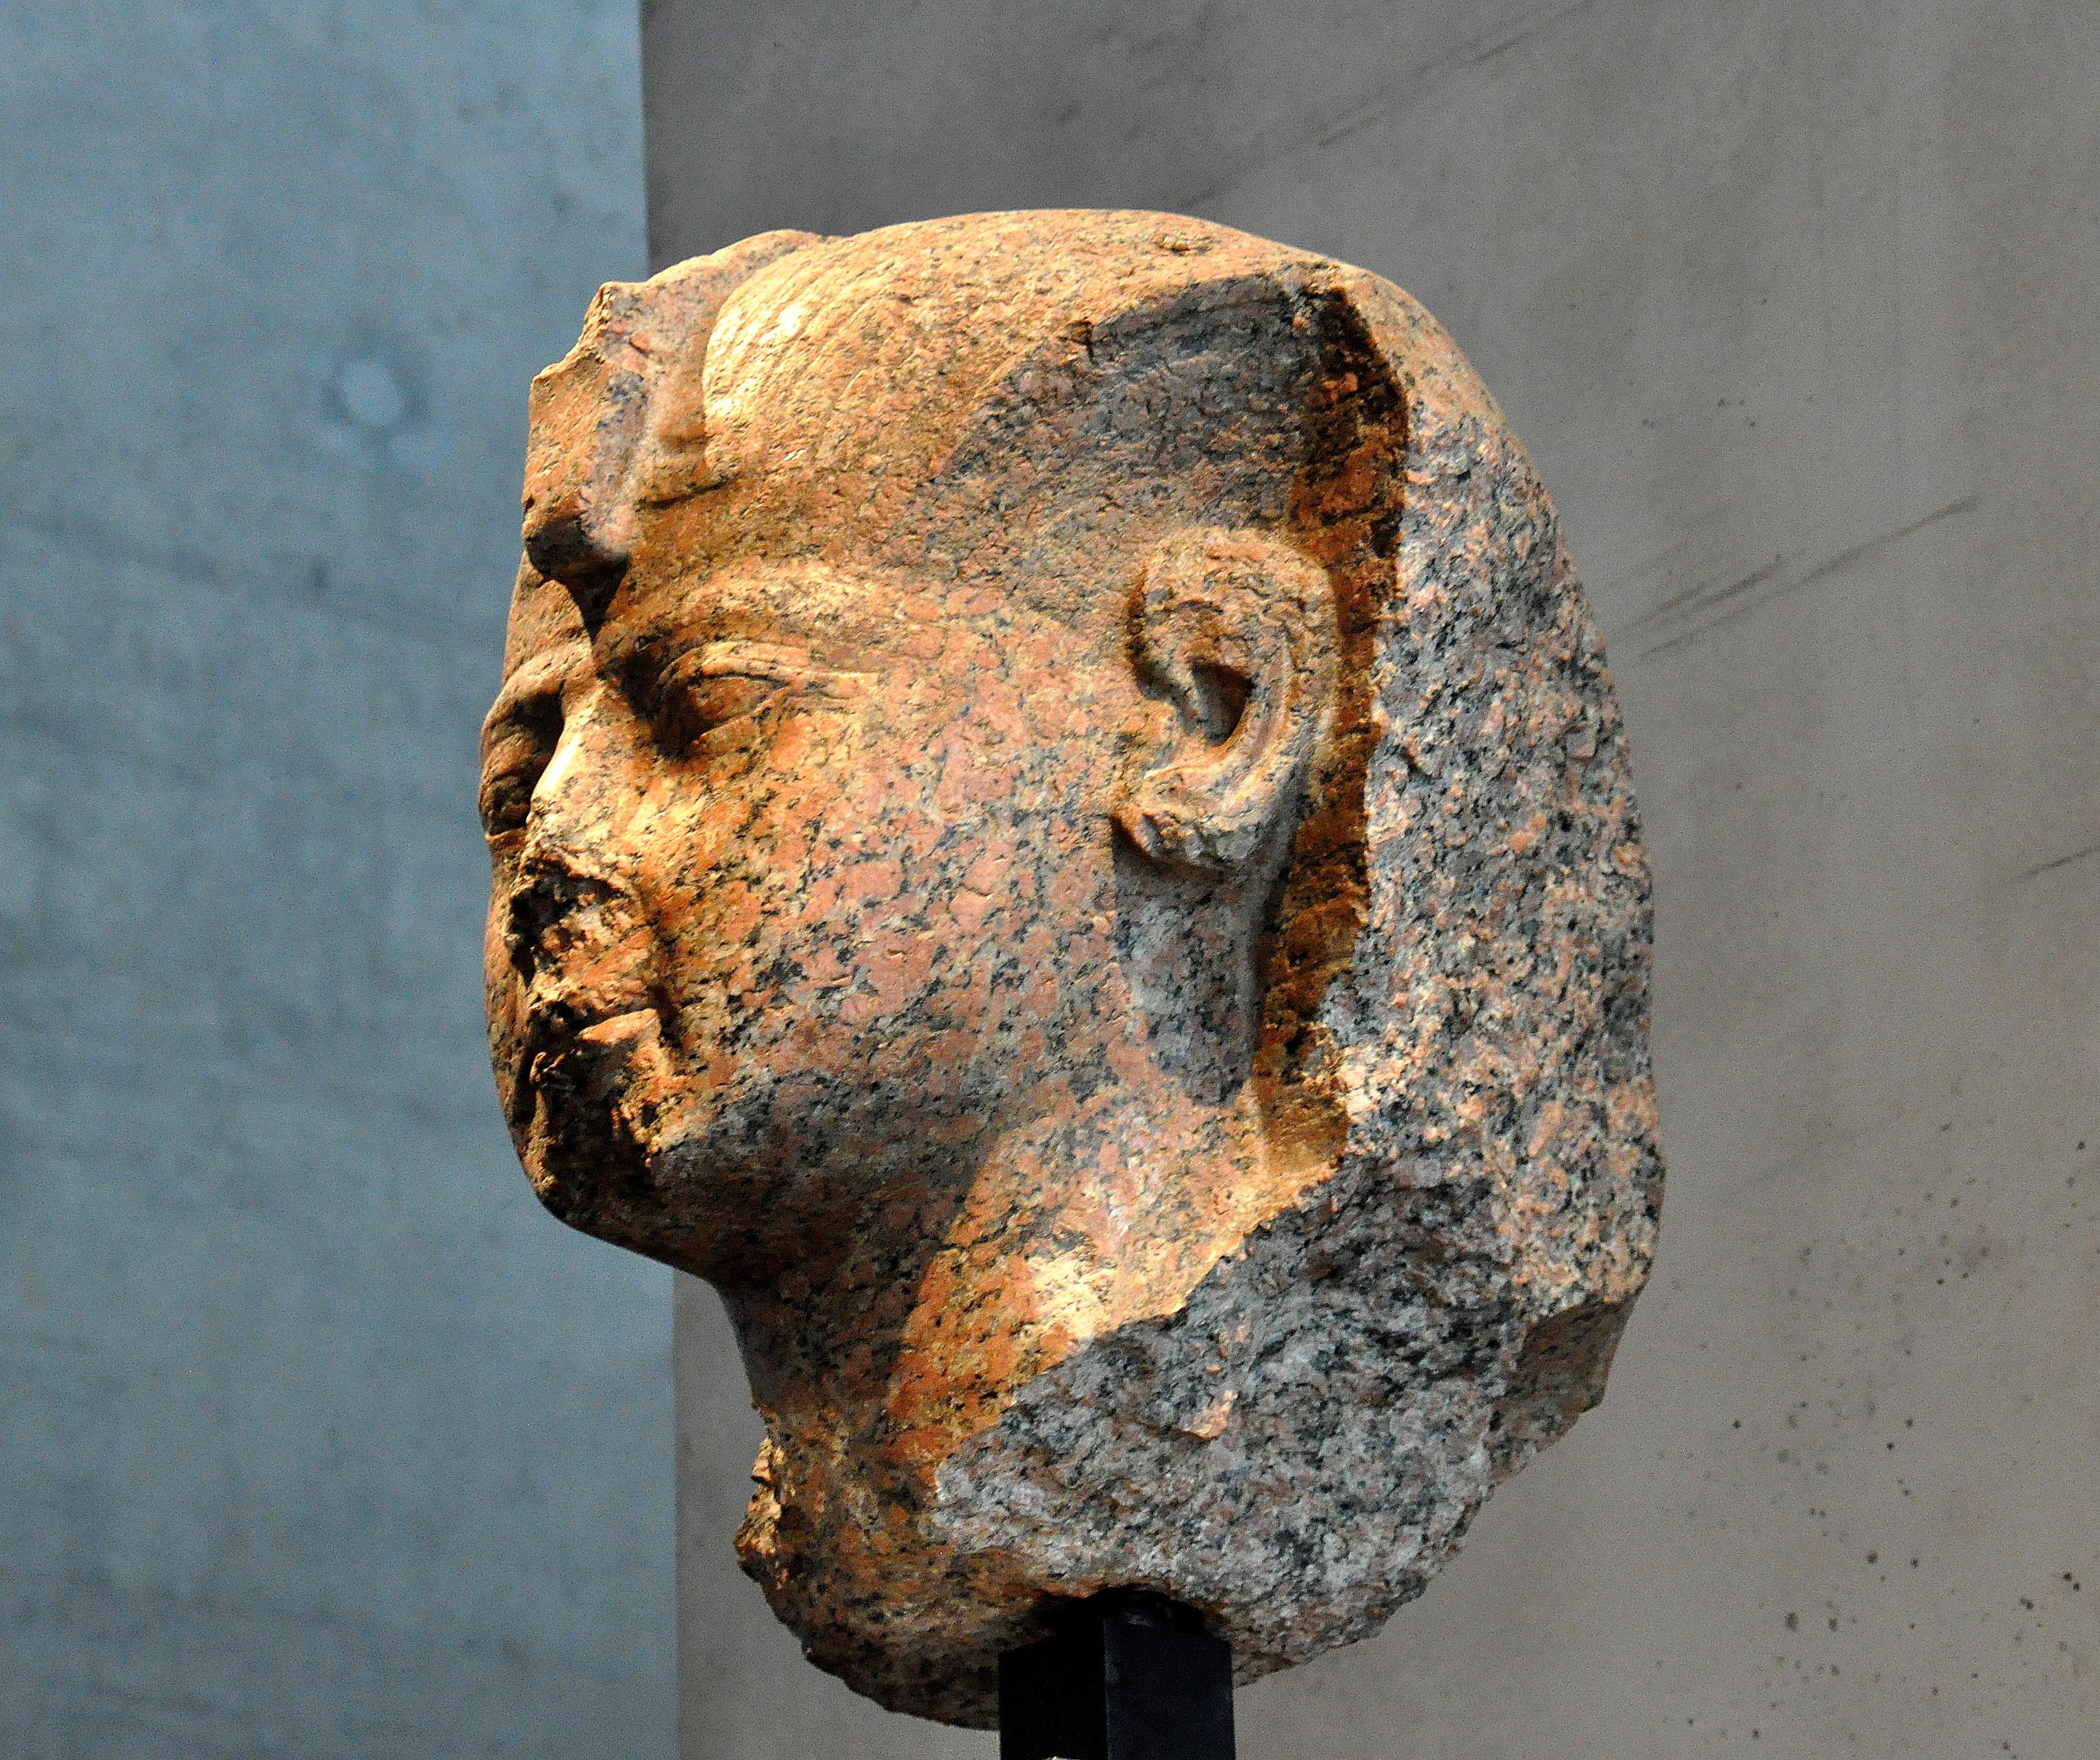 How has Pharoah Hatshepsut contributed to the Modern World?